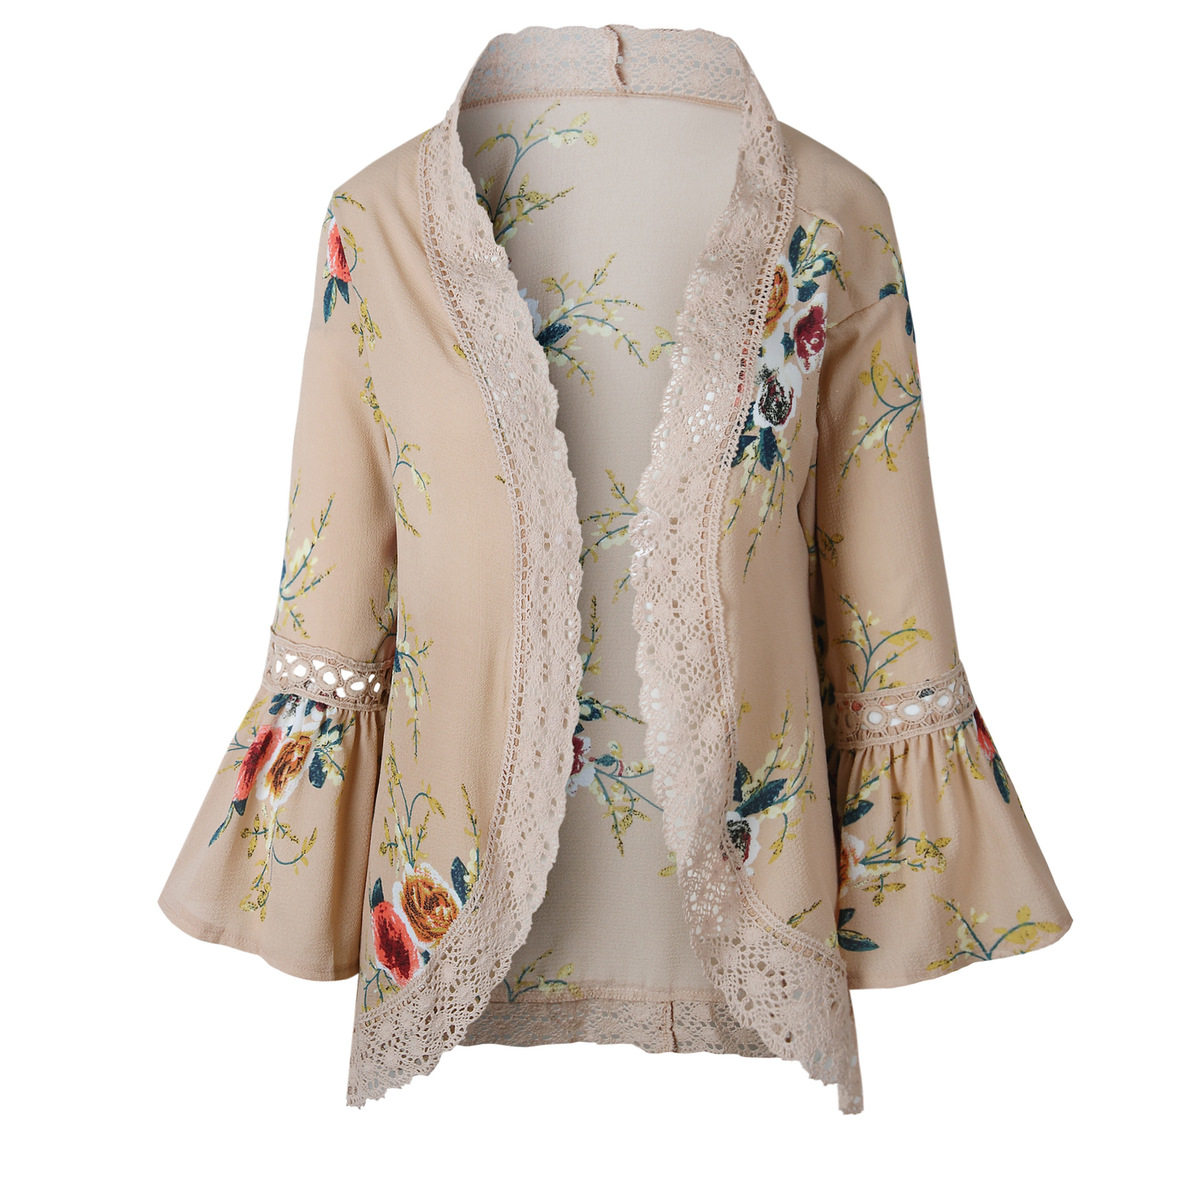 HTB1v49NEgmTBuNjy1Xbq6yMrVXa6 Women Plus Size Loose Casual Basic Jackets Female 2018 Autumn Long Flare Sleeve Floral Print Outwear Coat Open Stitch Clothing